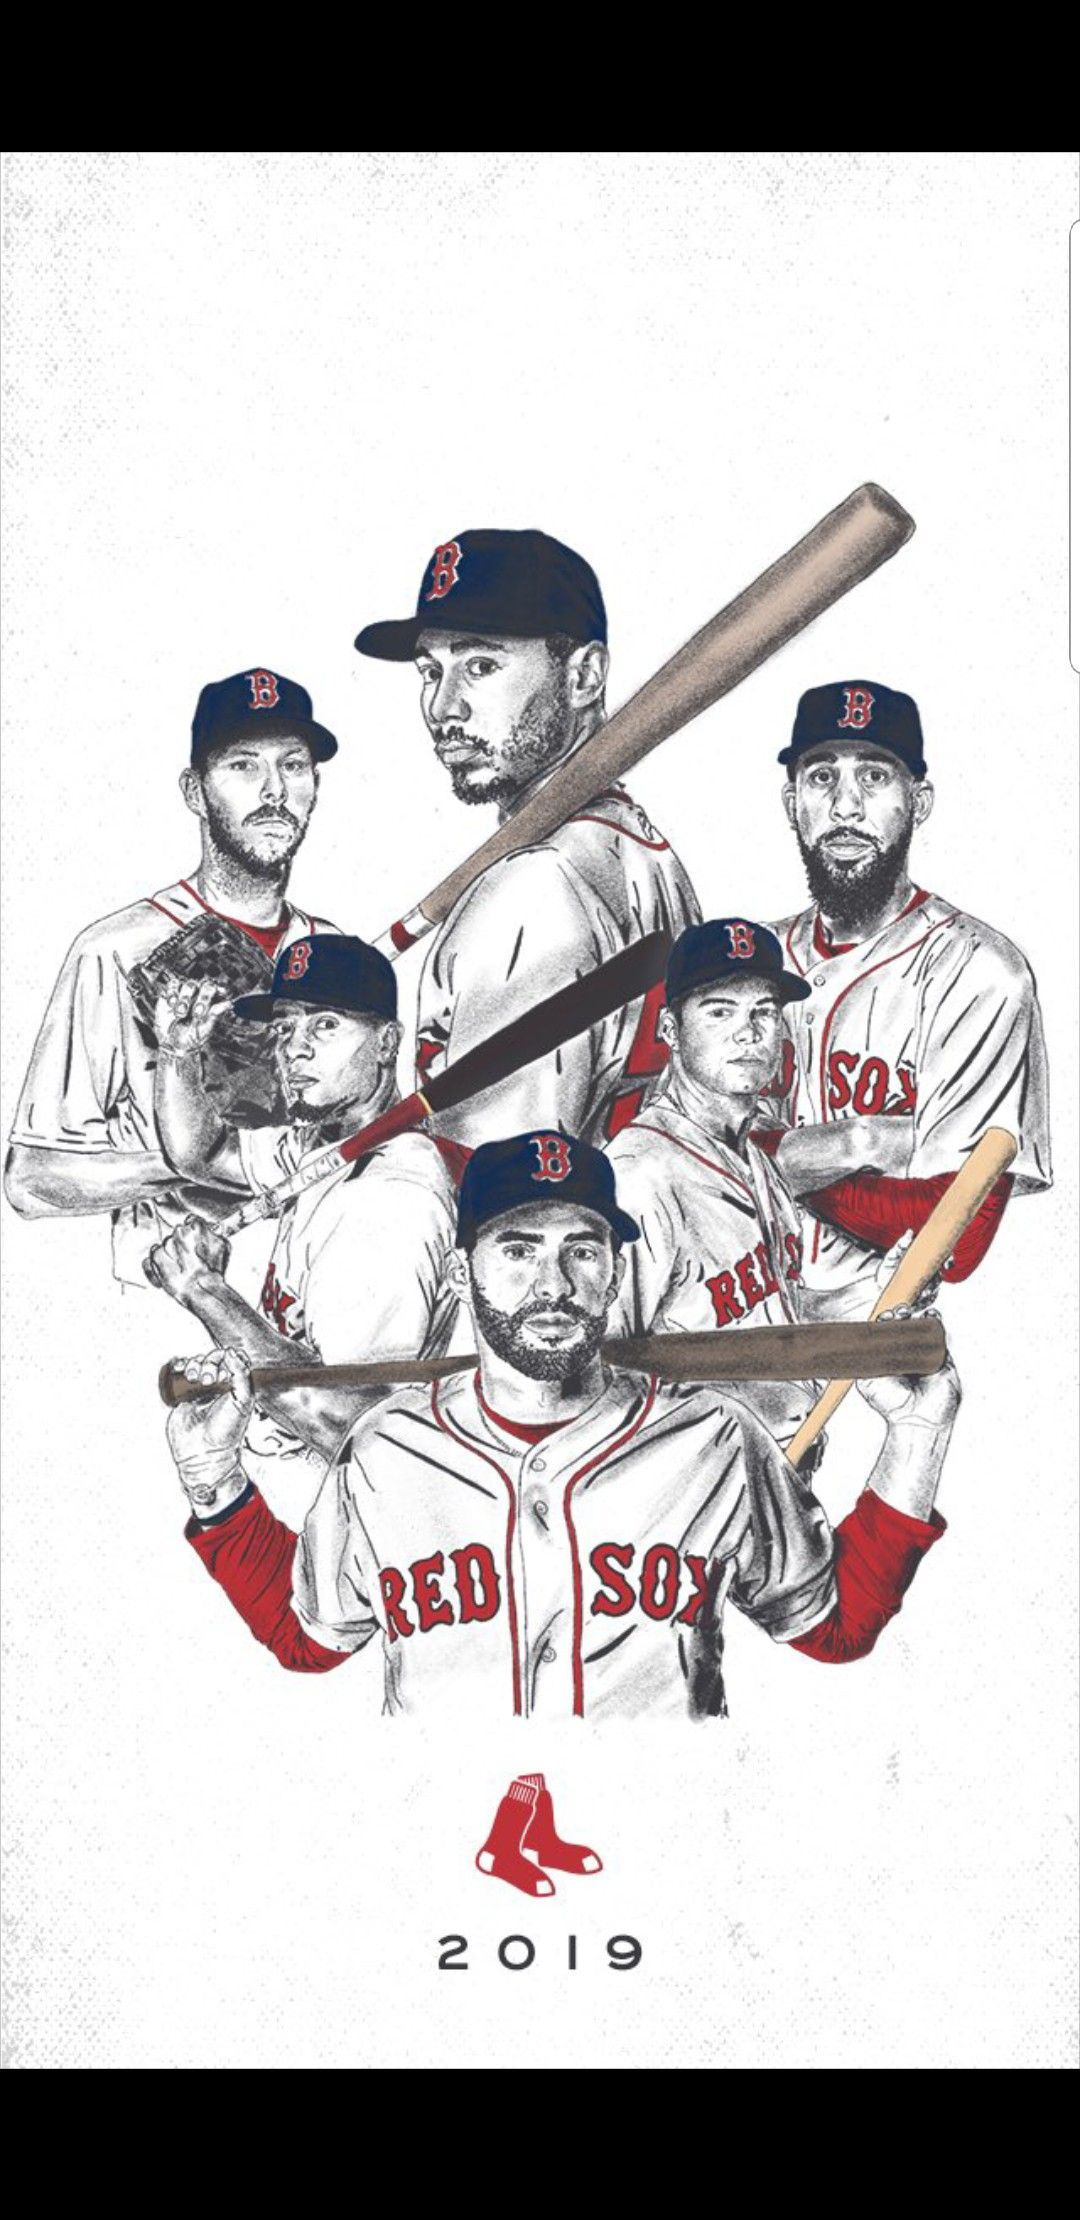 2019 Red Sox   Boston red sox players, Boston red sox ...